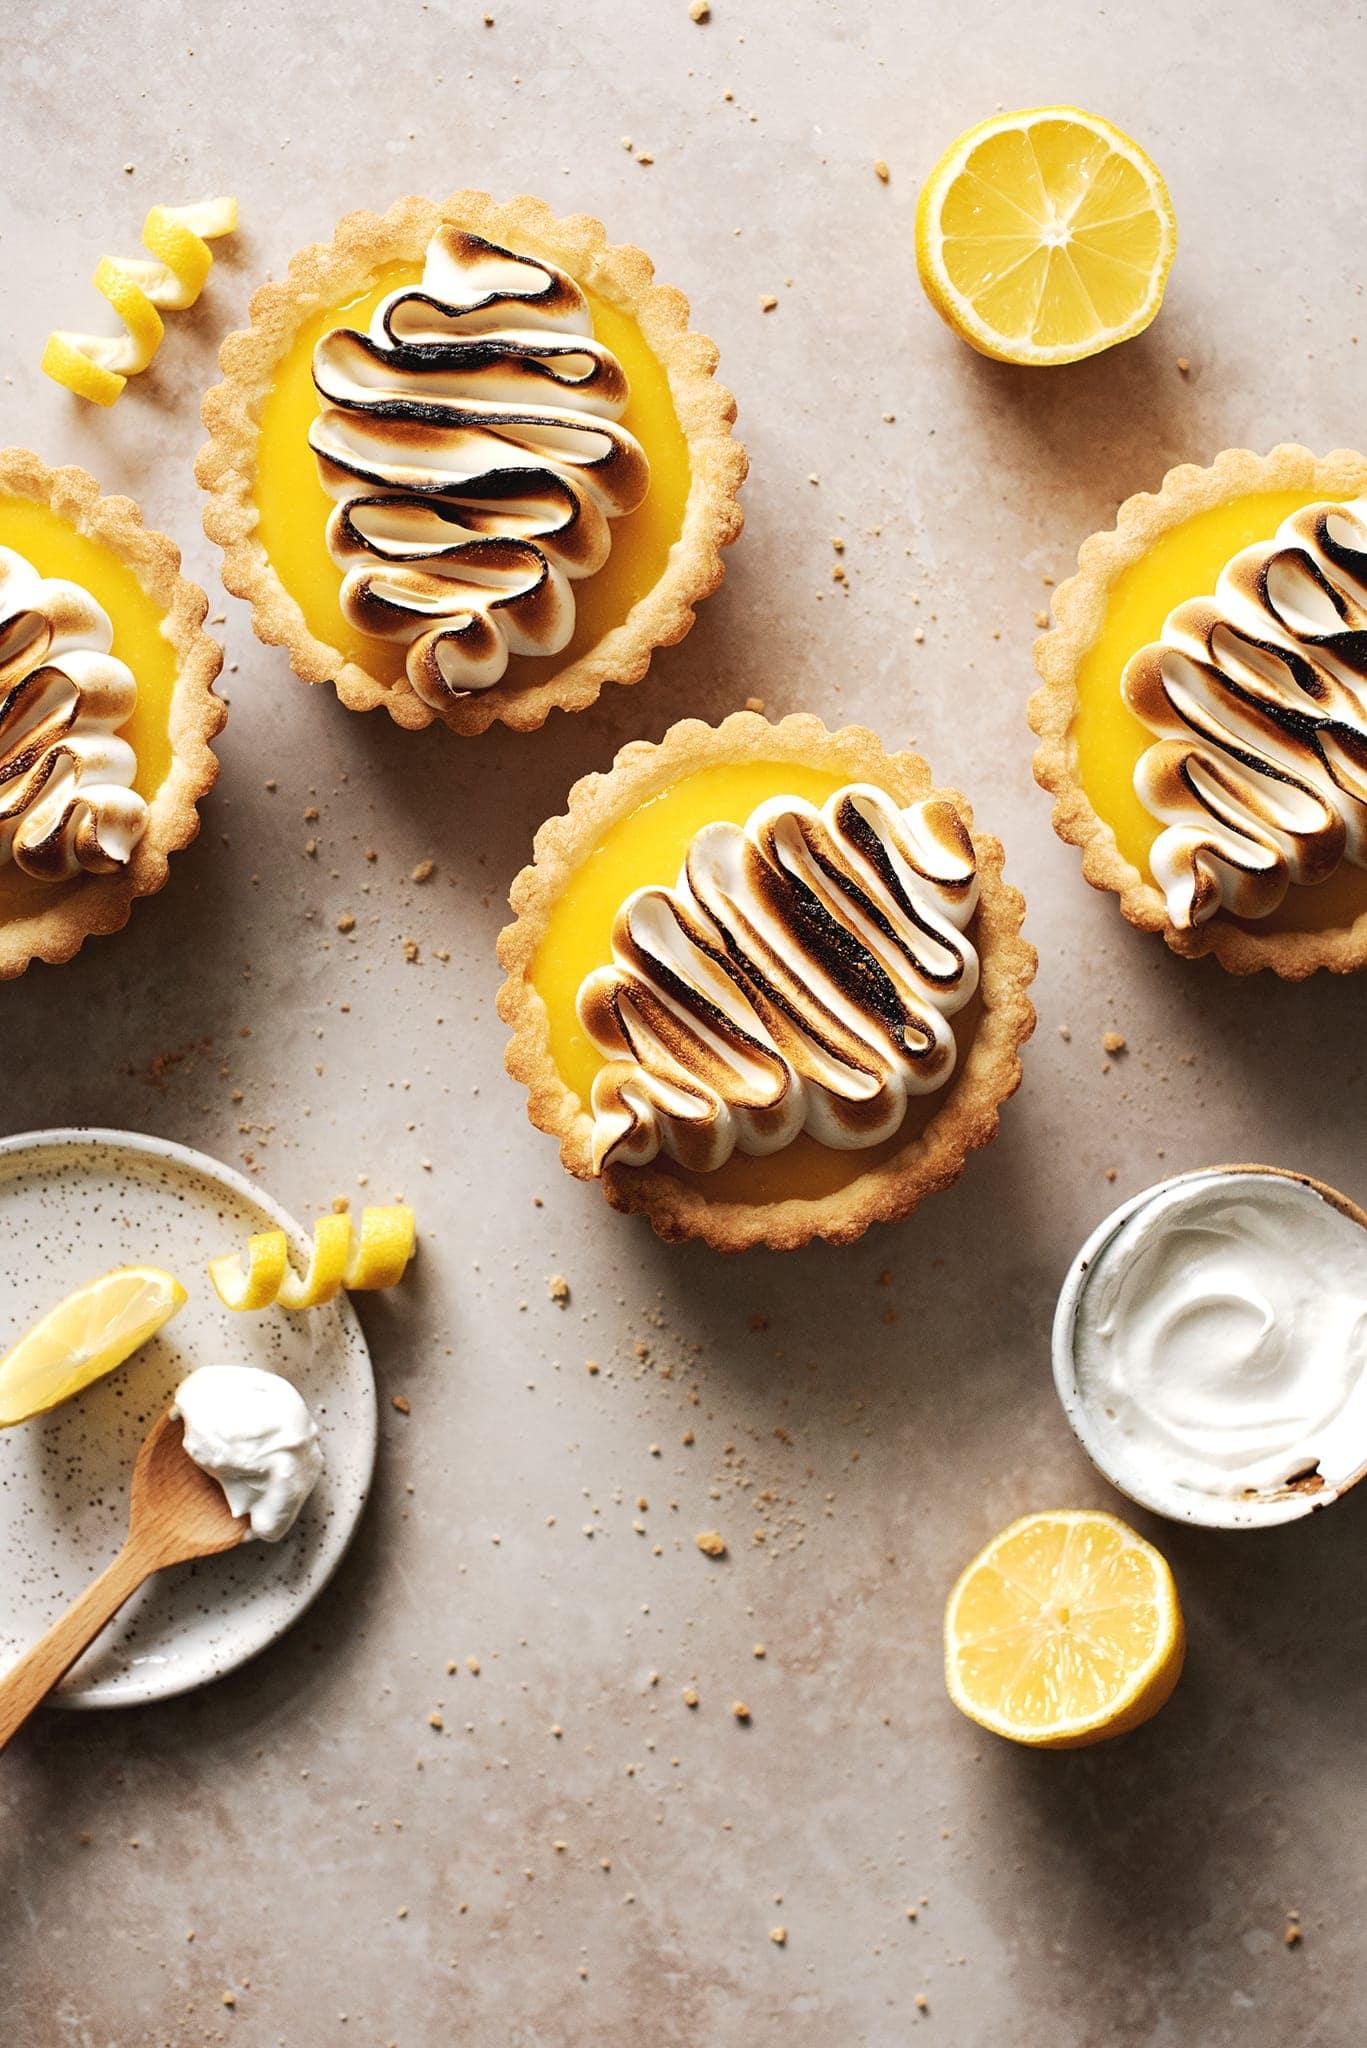 Mini lemon meringue tarts on brown surface